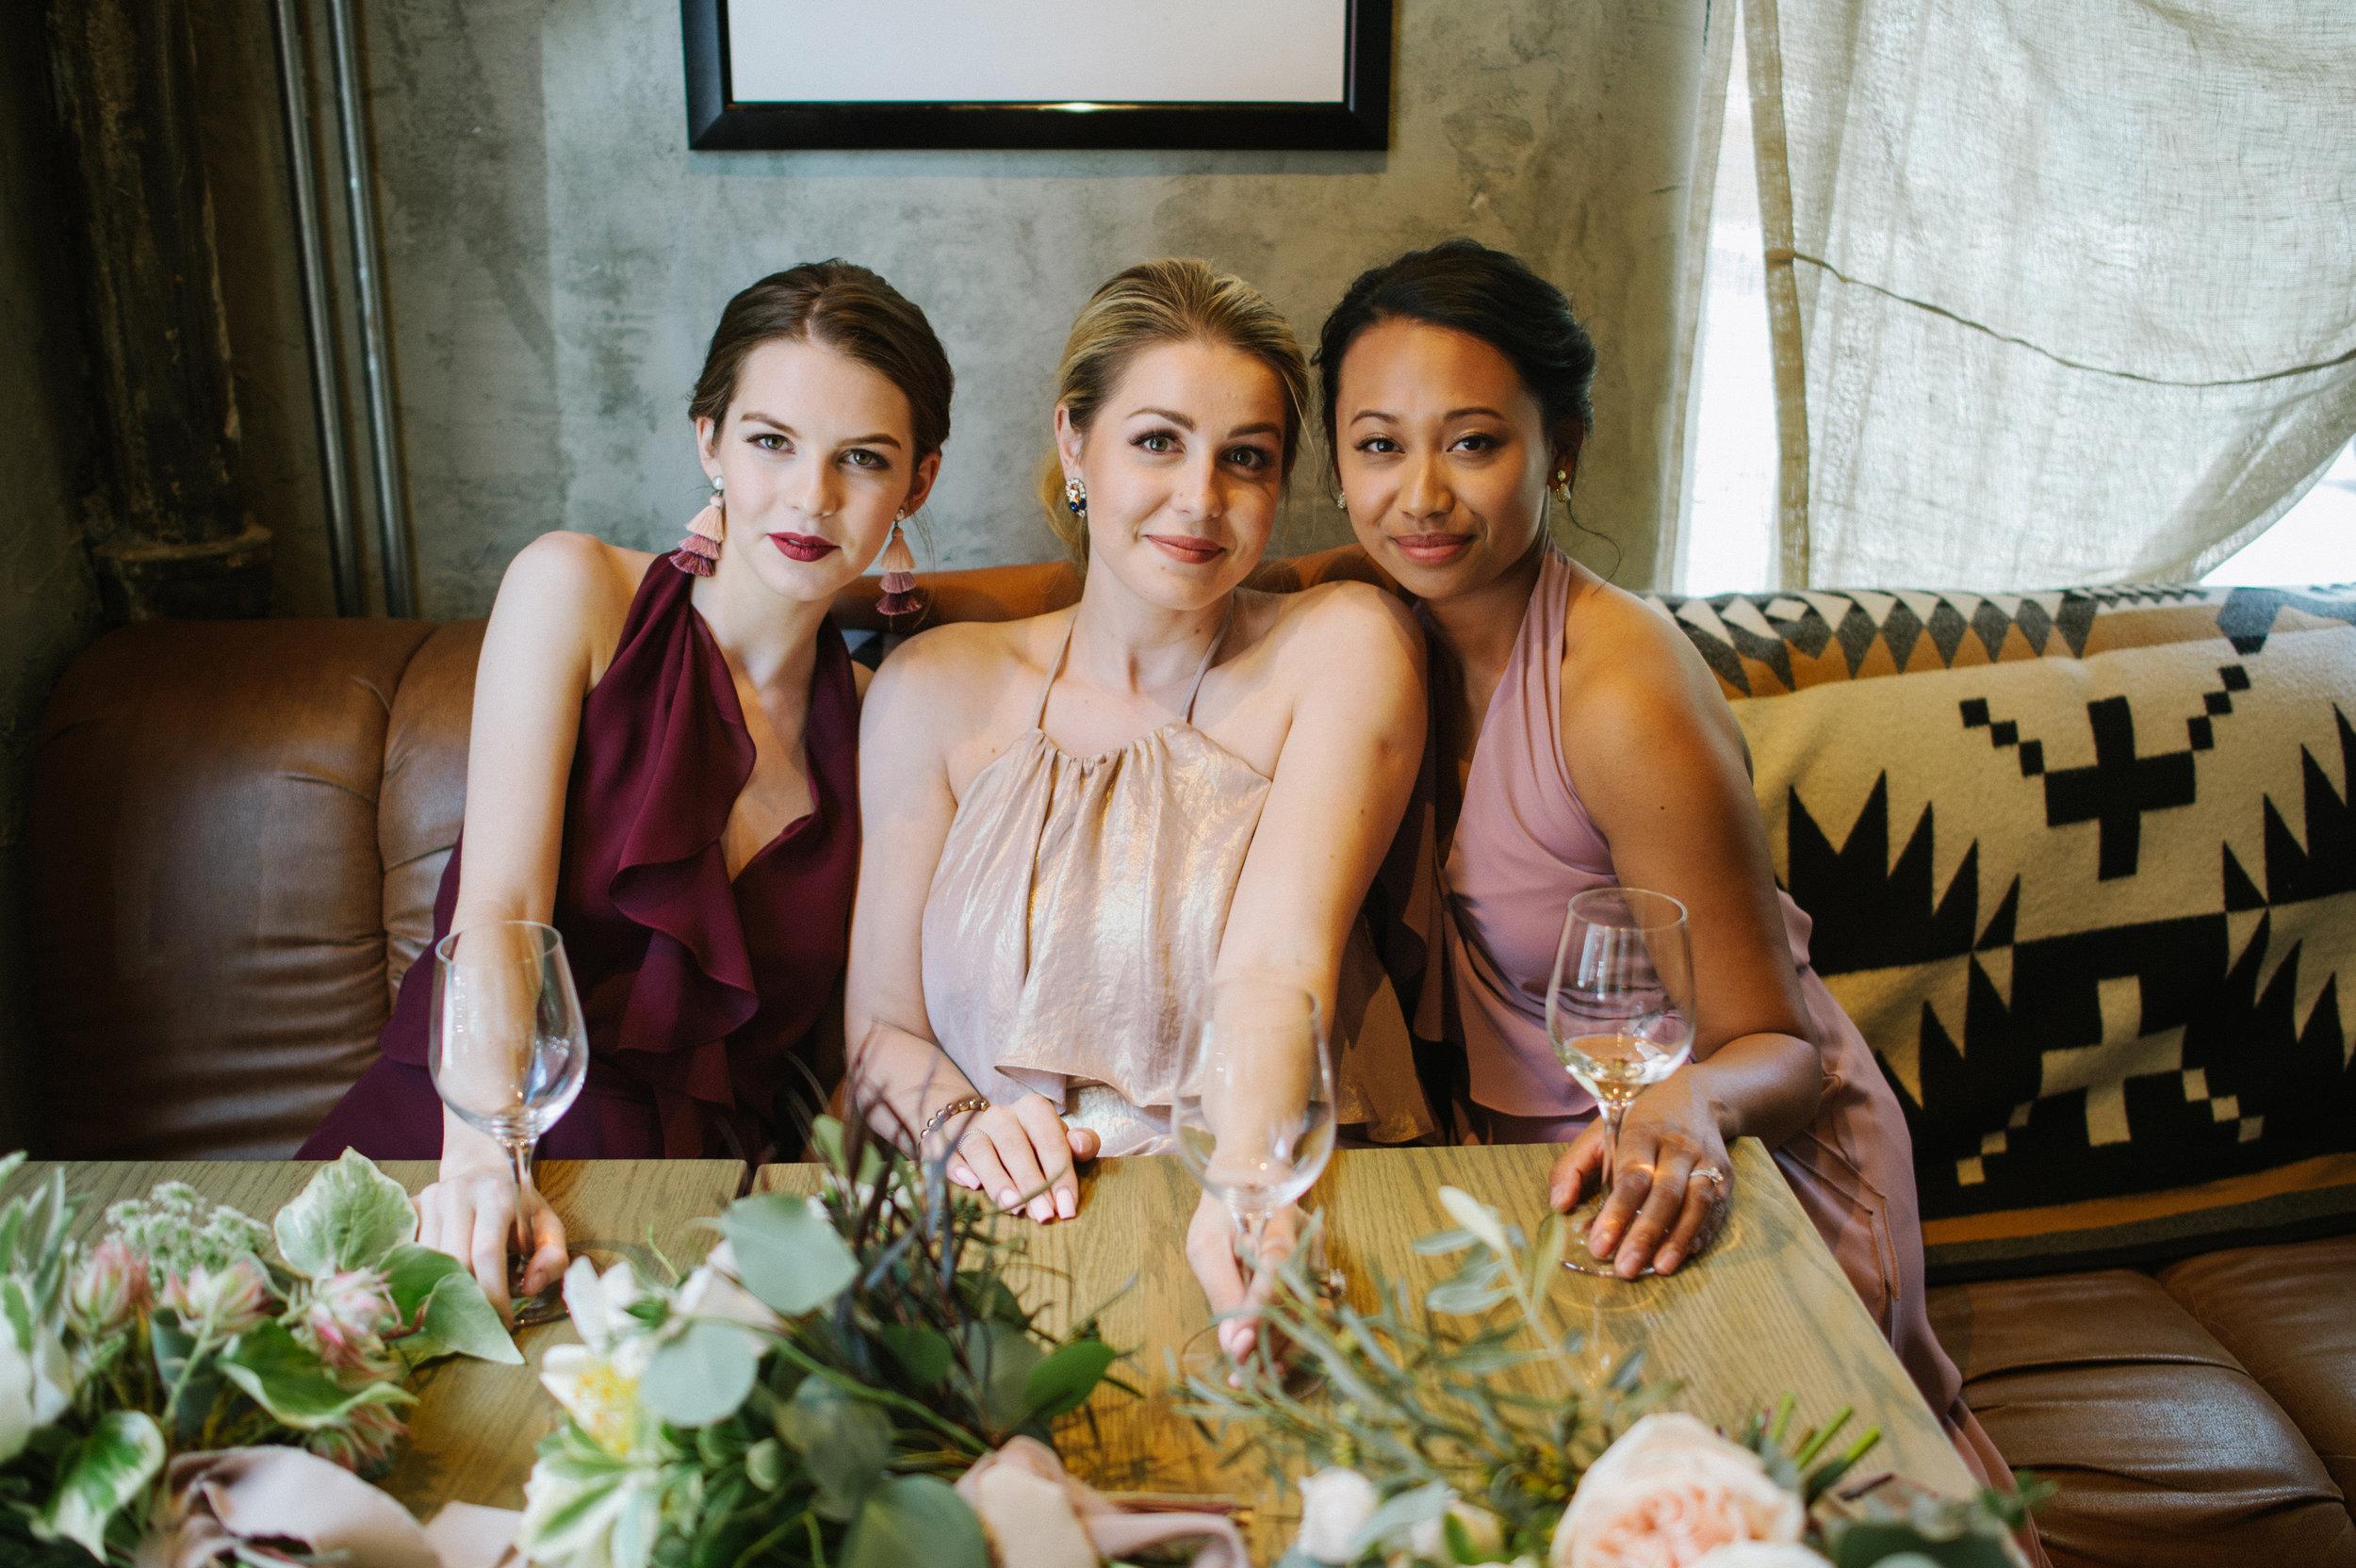 Calgary_Wedding_Photography_Bridgette_Bar_Bridesmaids_Shoot_2018_HR094.jpg